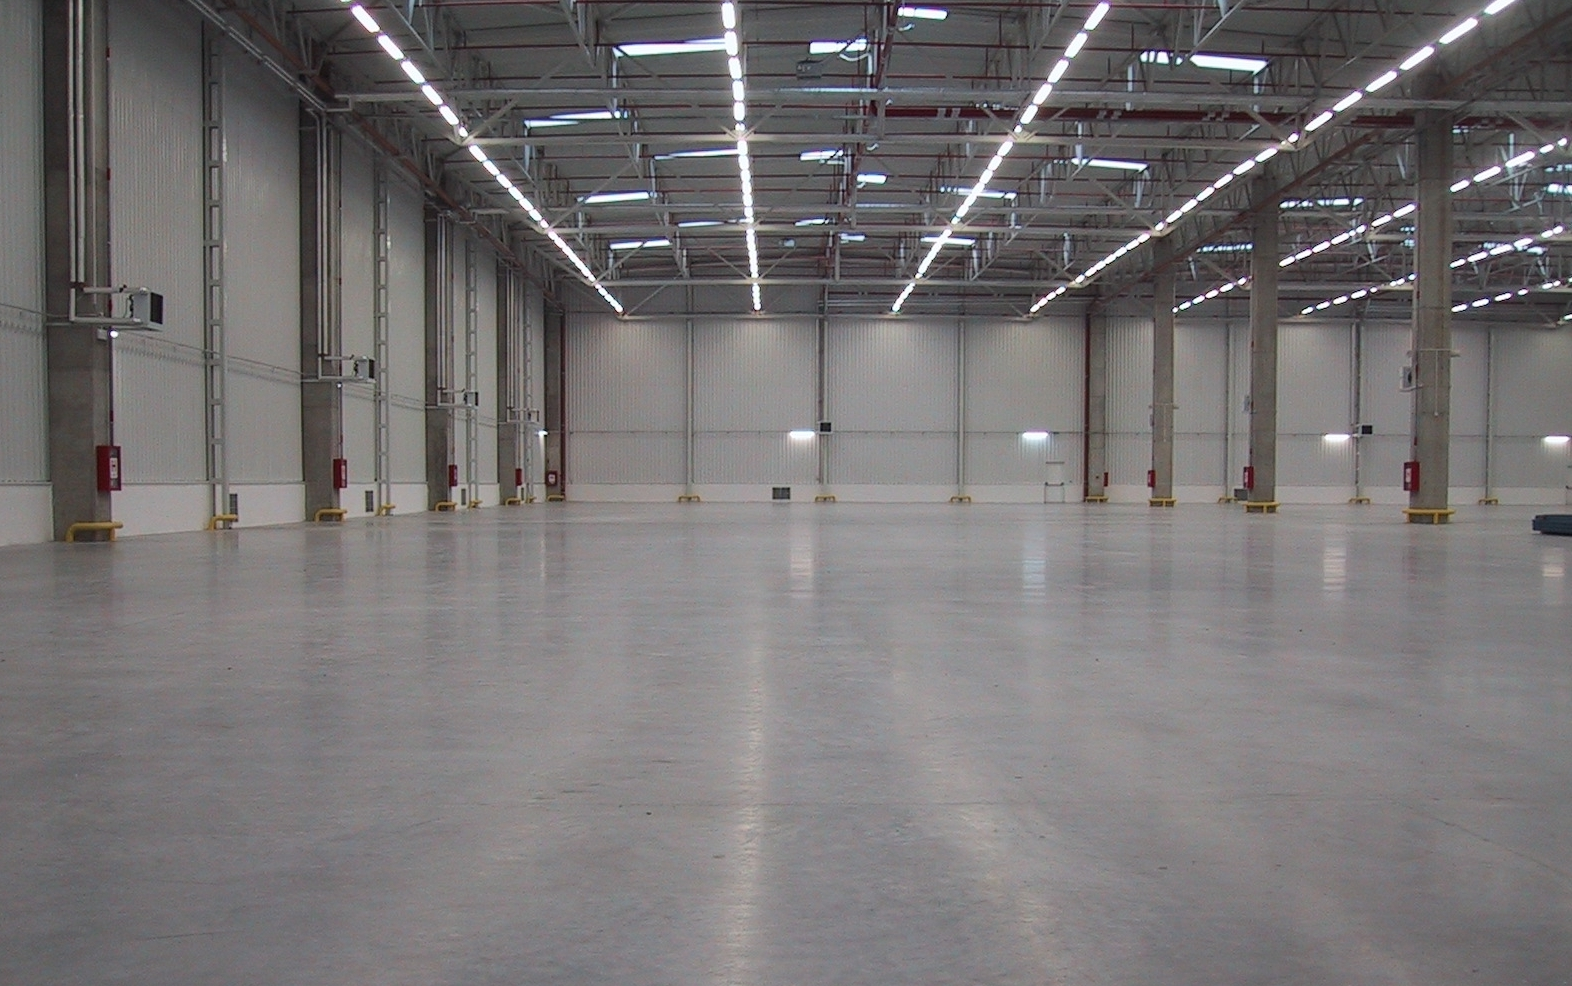 Northants Concrete Industrial Flooring Kettering Wellingborough Milton Keynes Corby Bedford